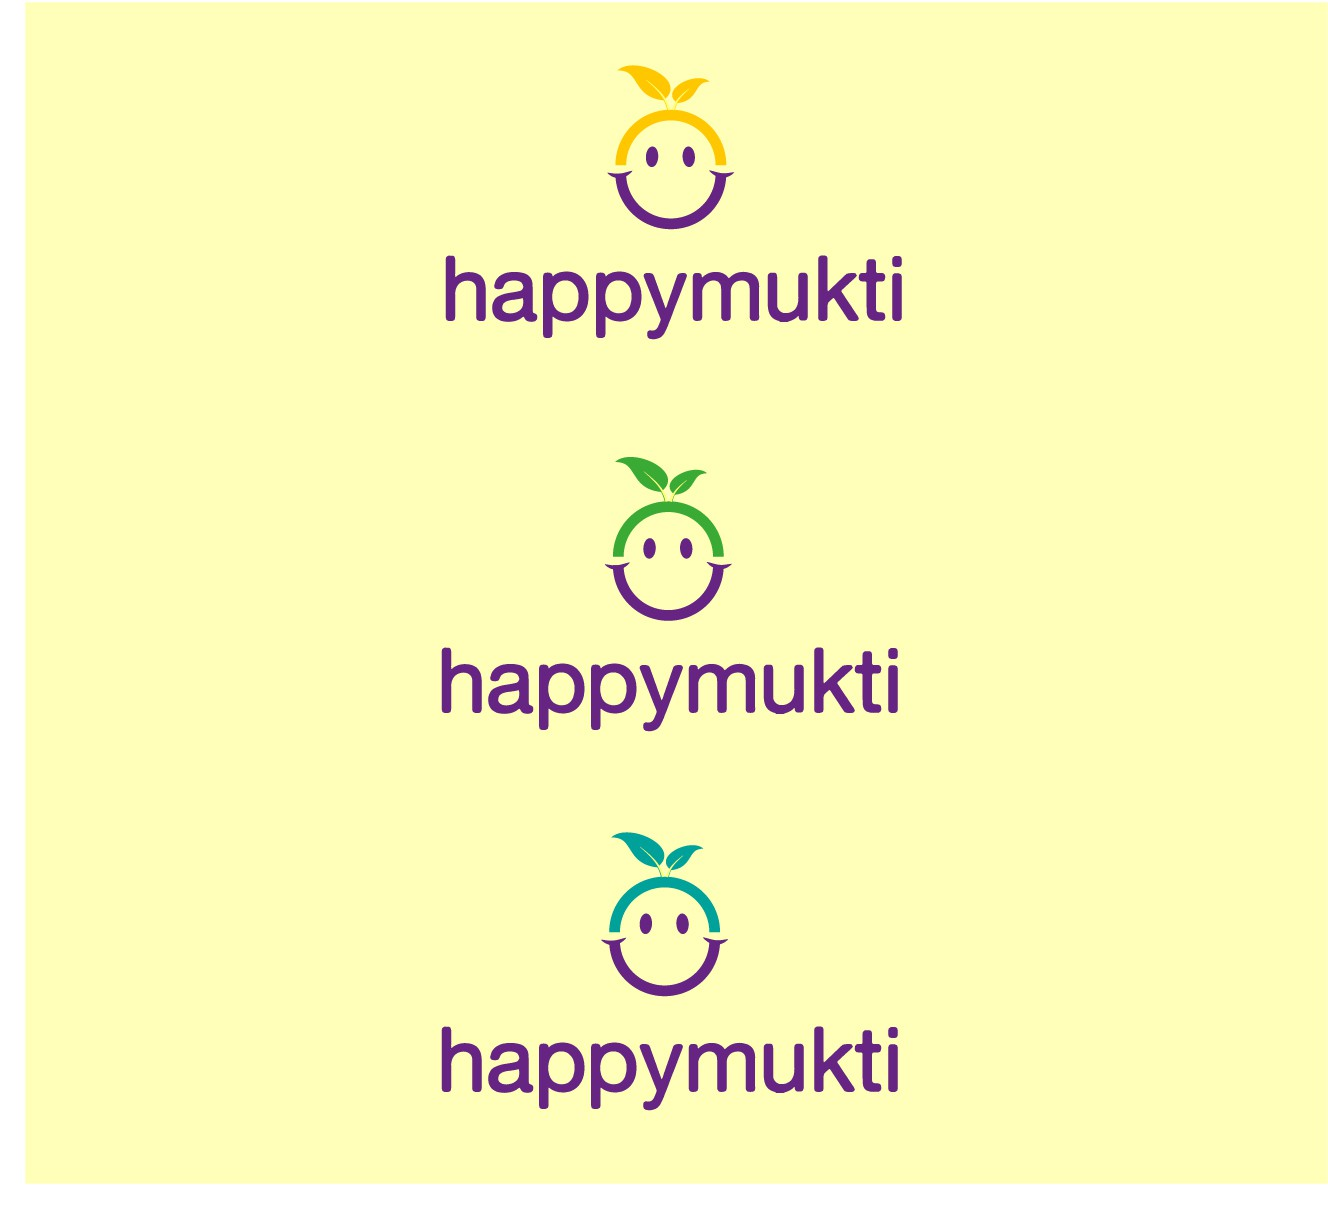 logo for happymukti (all lowercase)